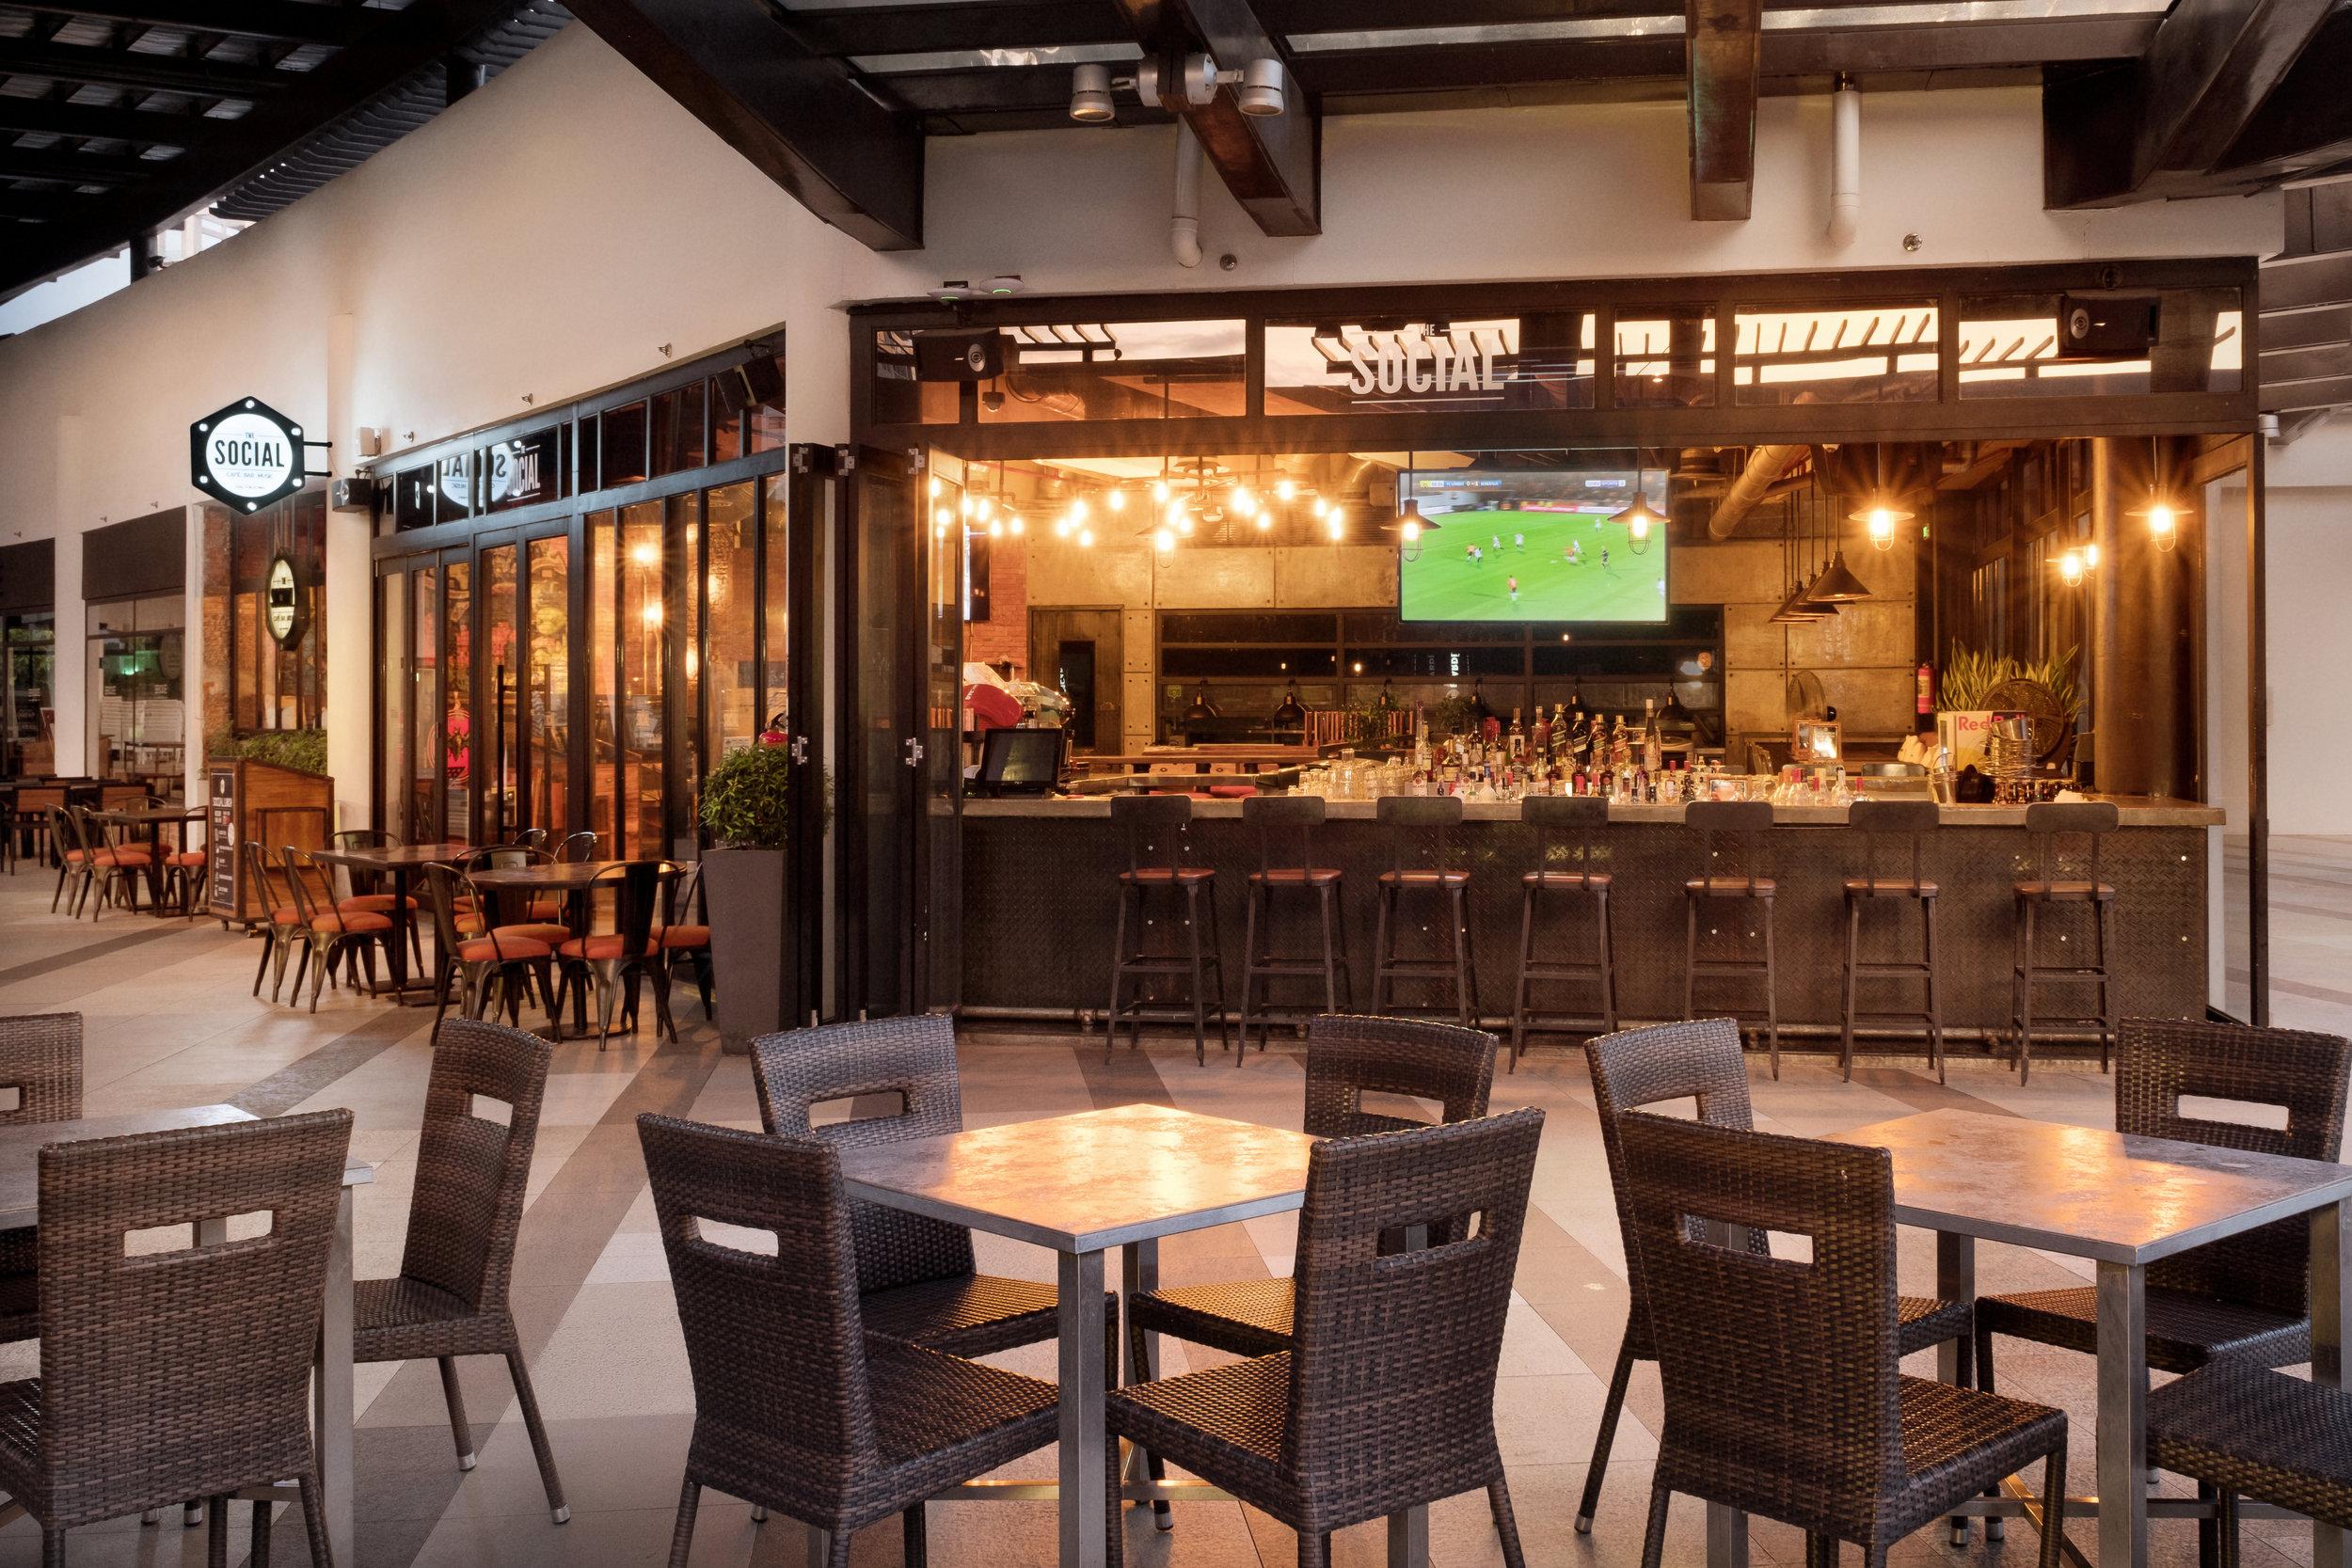 The Social Cebu | Tadcaster Hospitality